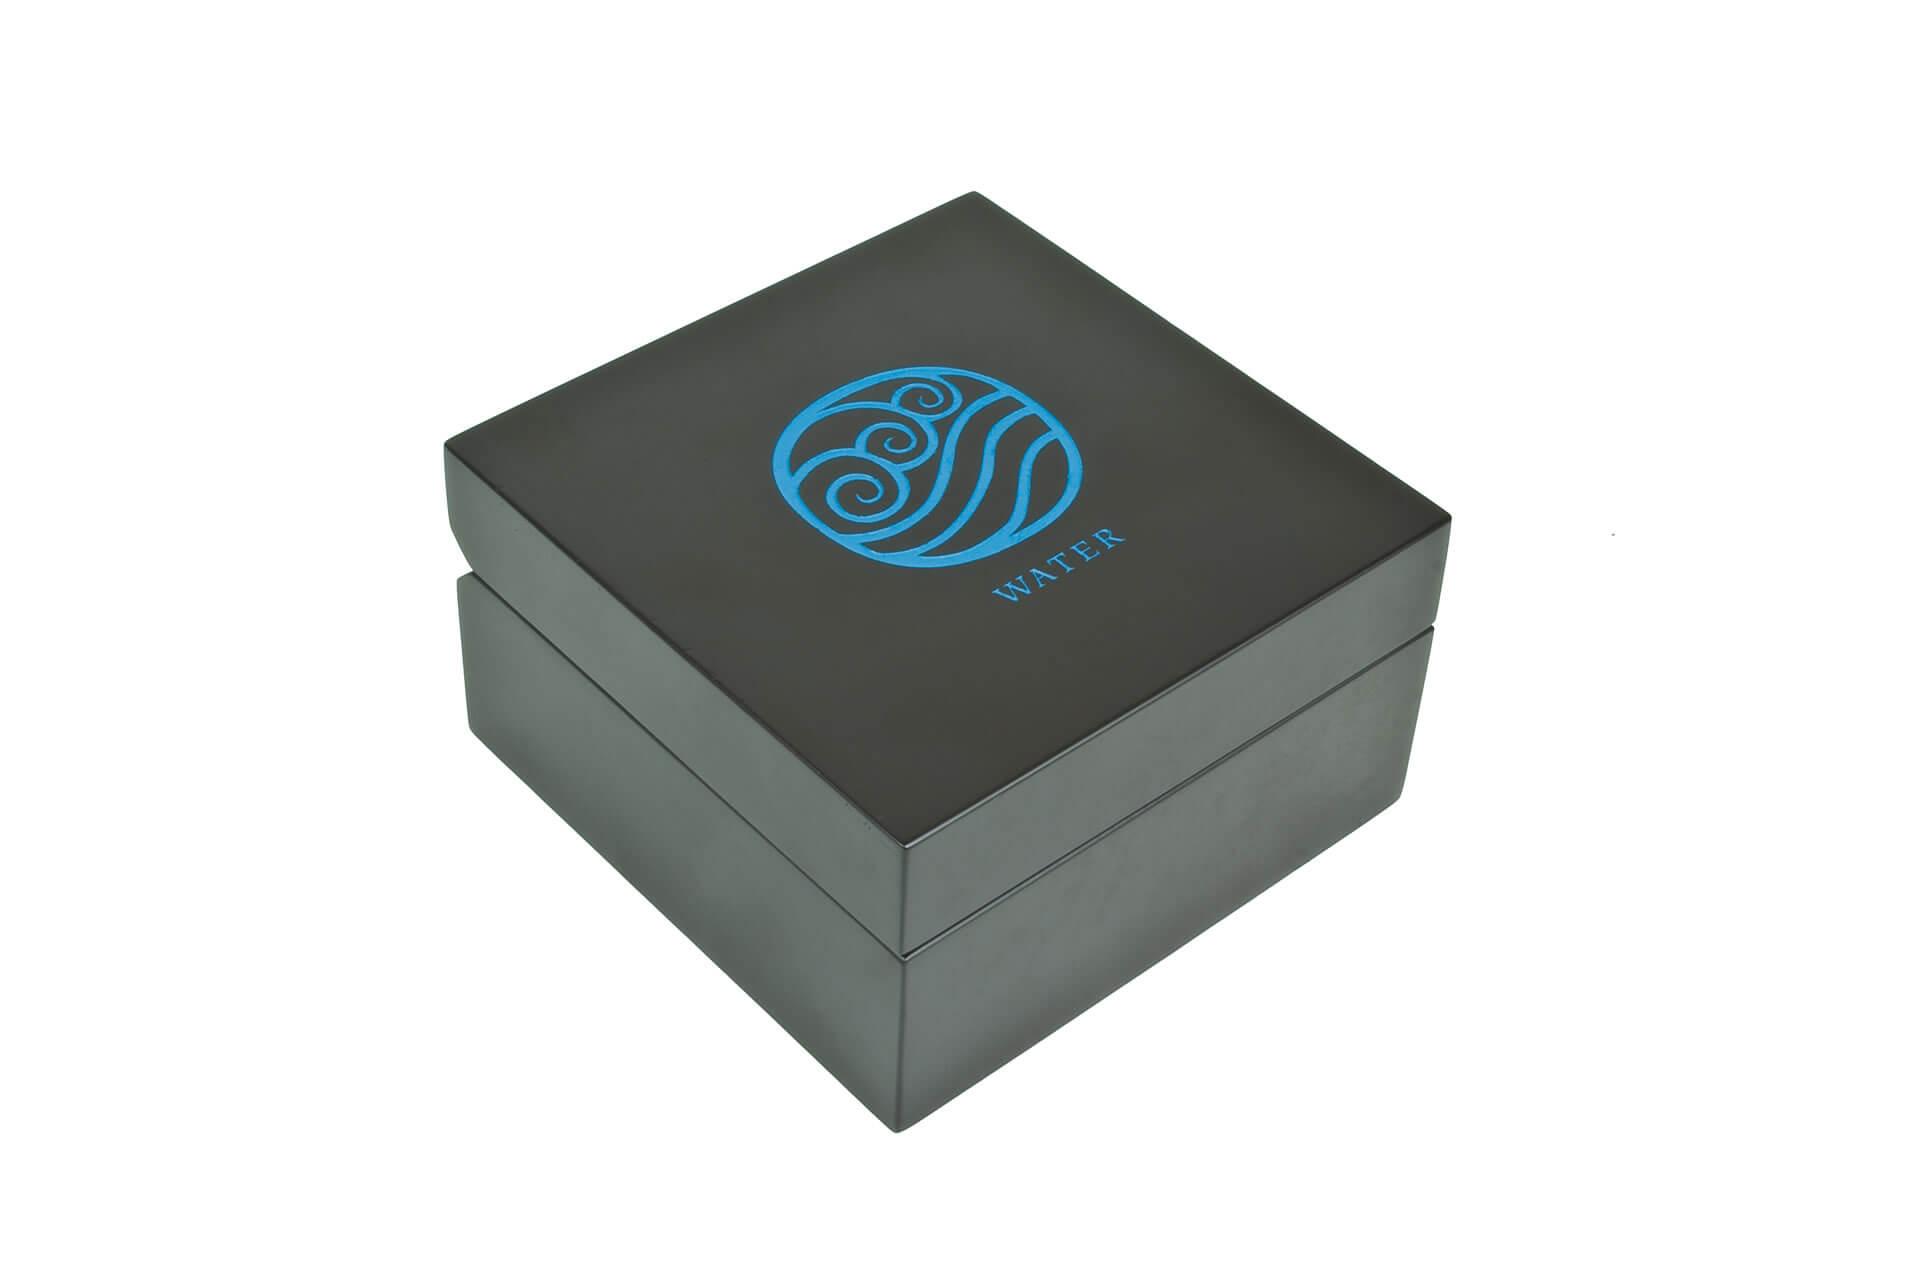 bespoke wooden car wax packaging laser engraved blue infill closed